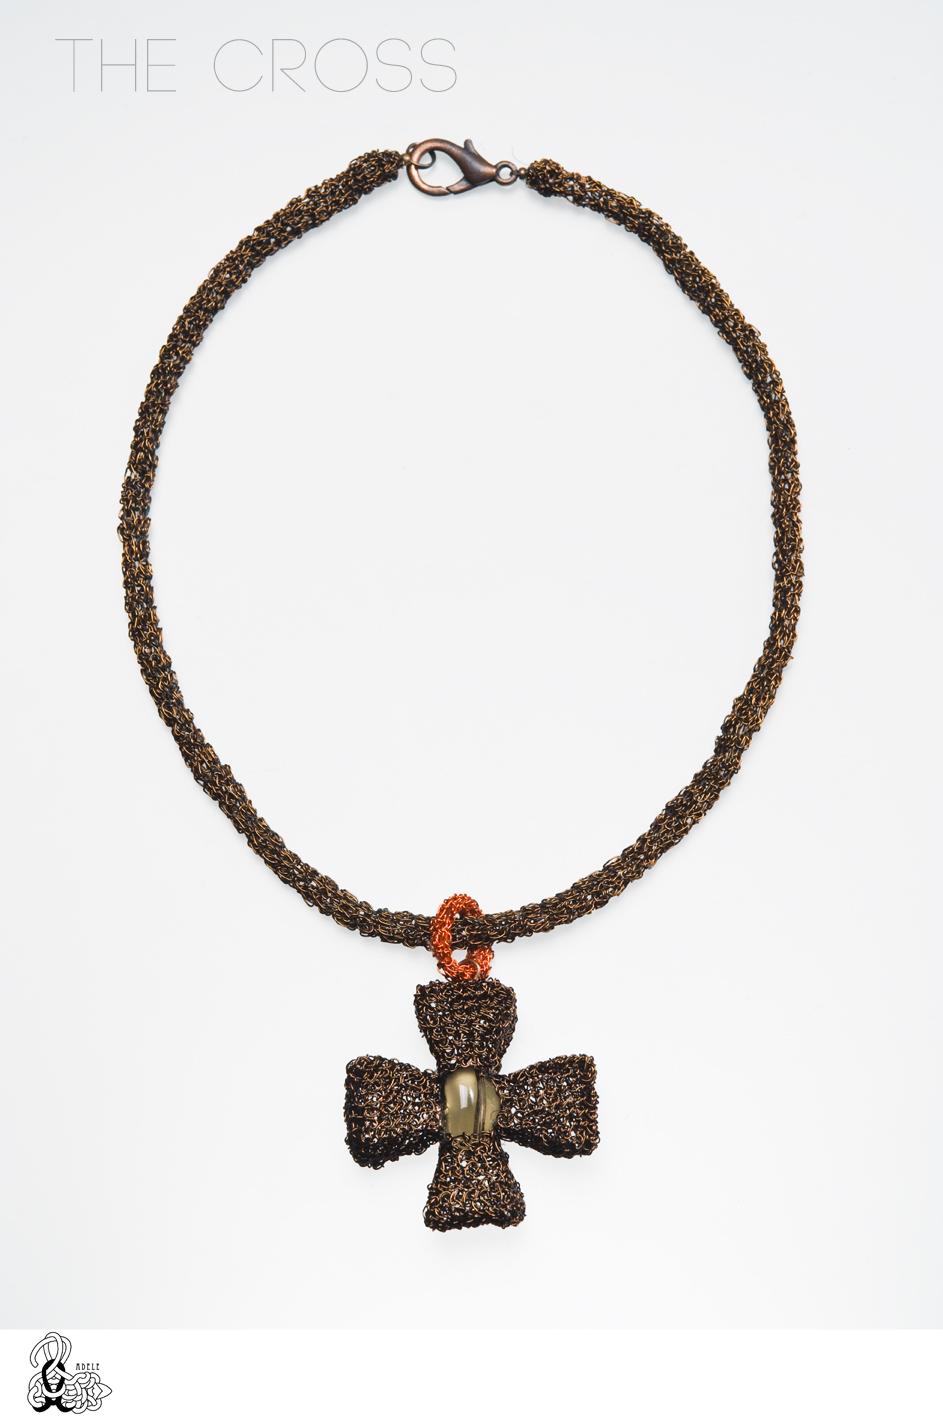 The Cross - hand made! Materials: Jewelry Copper Wire, Smoky Quartz ...